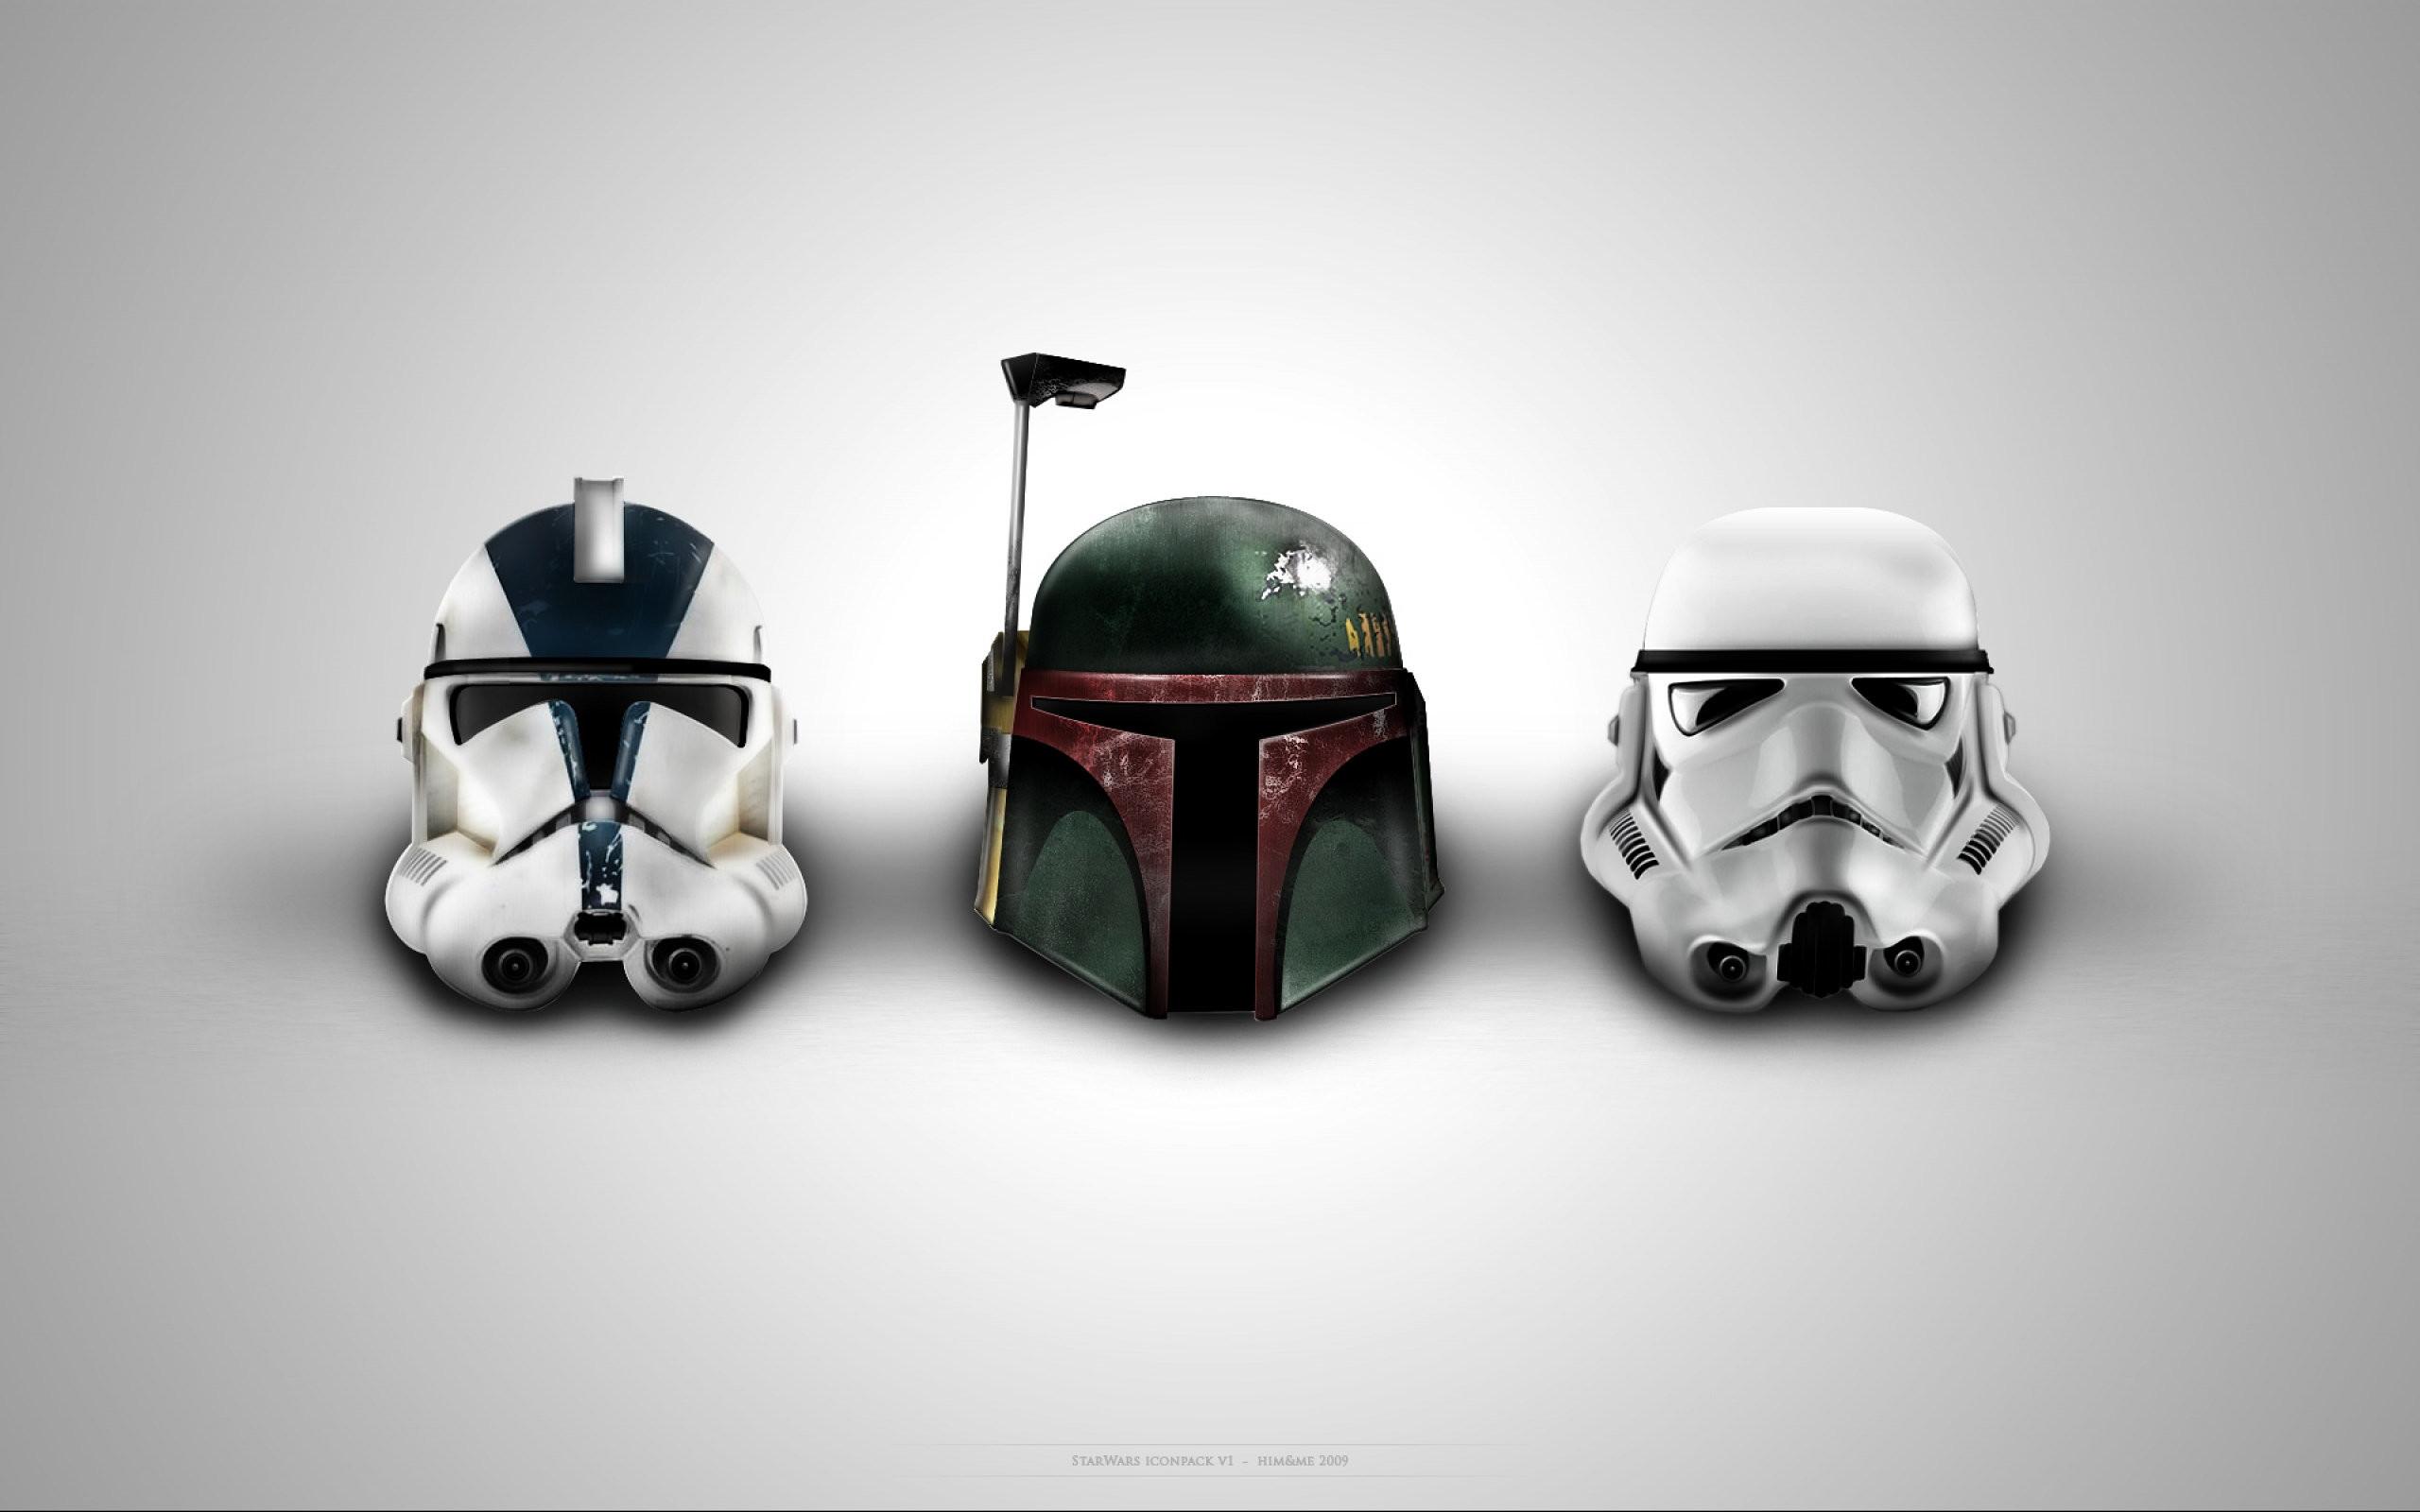 Star Wars HD Photos by Verona Kemplin on AHDzBooK.com